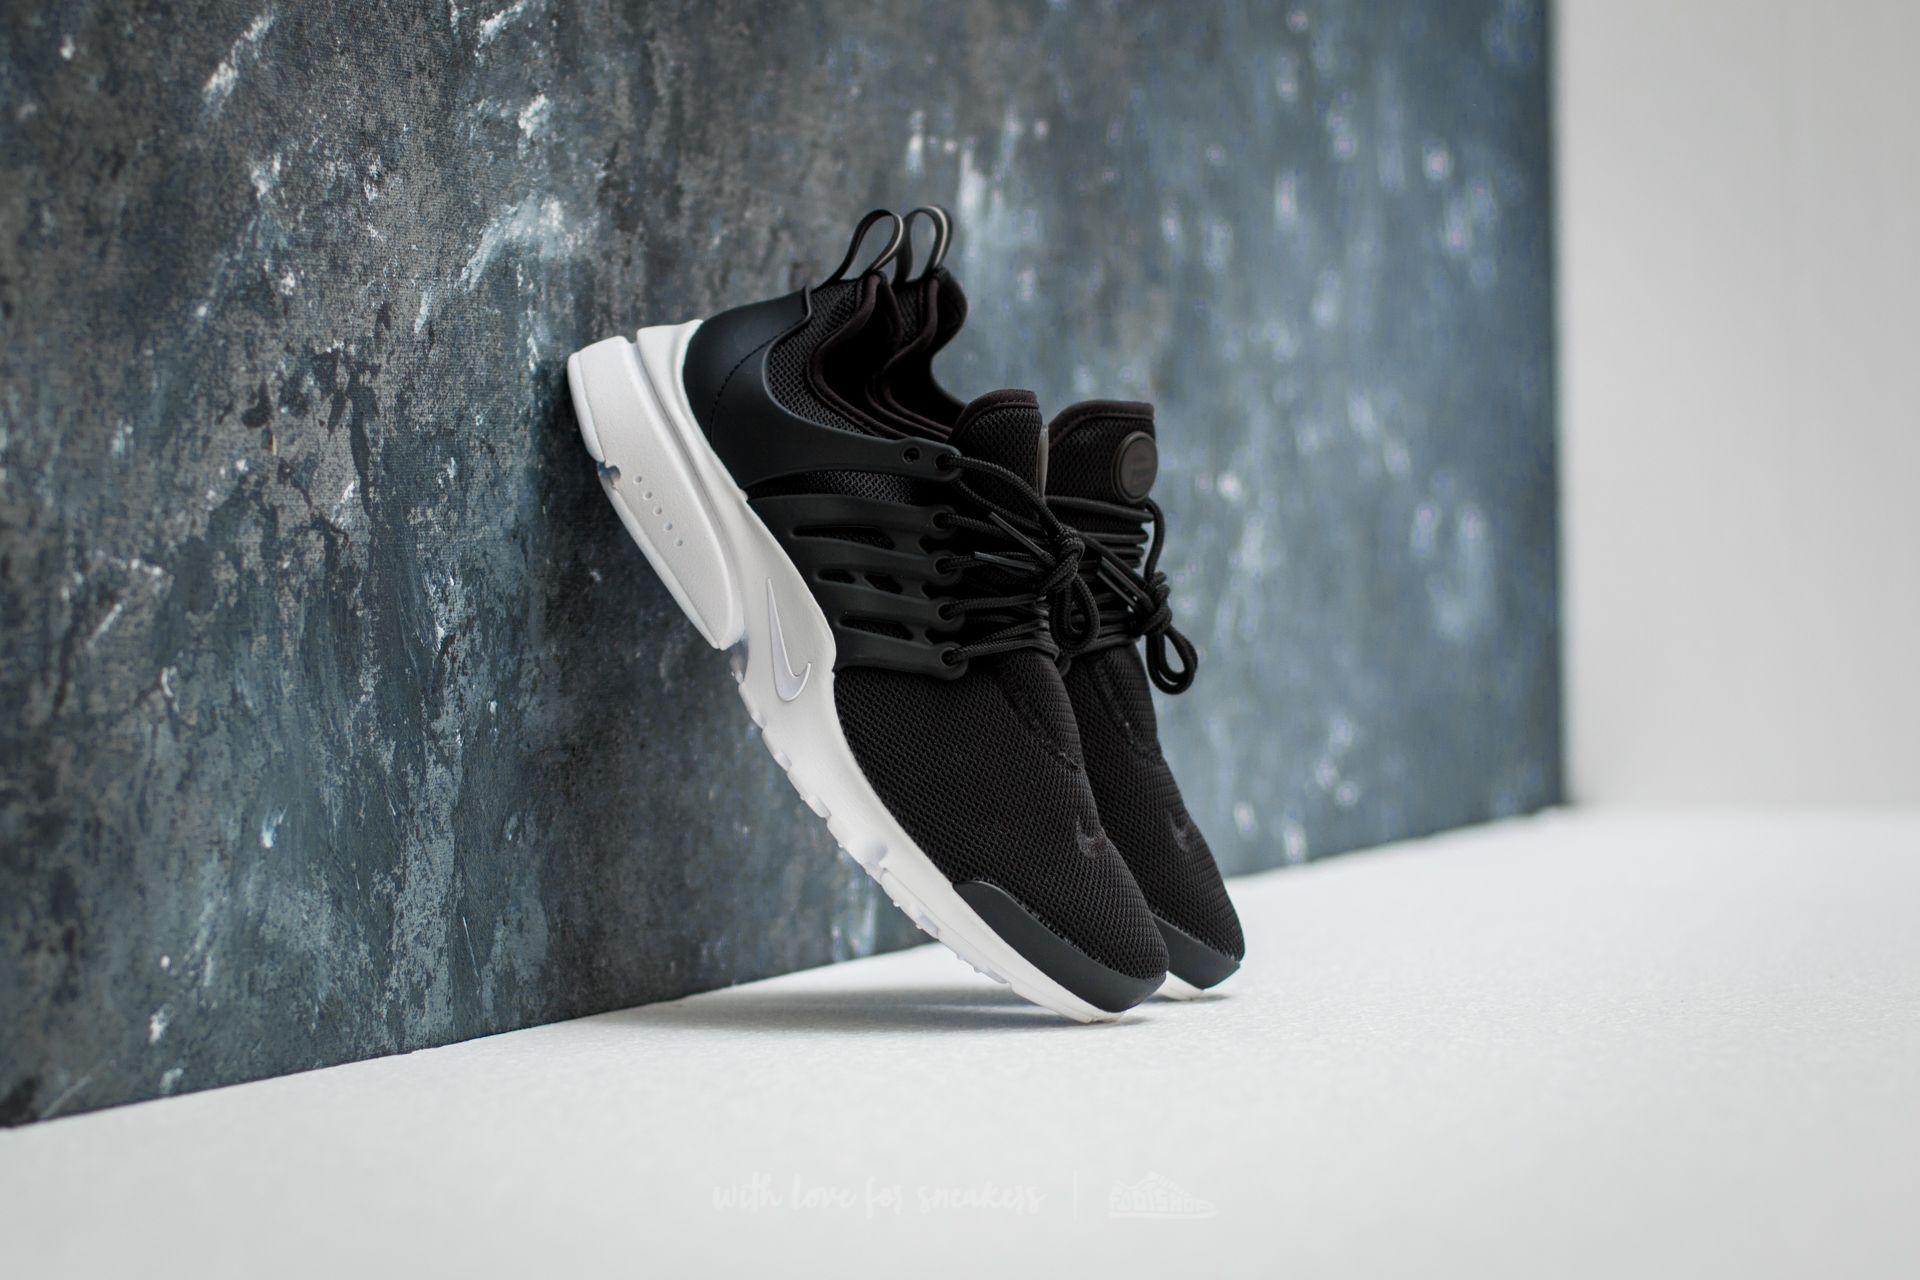 Nike Wmns Air Presto Ultra Br Black/ Black-White-Glacier Blue Footshop – FR